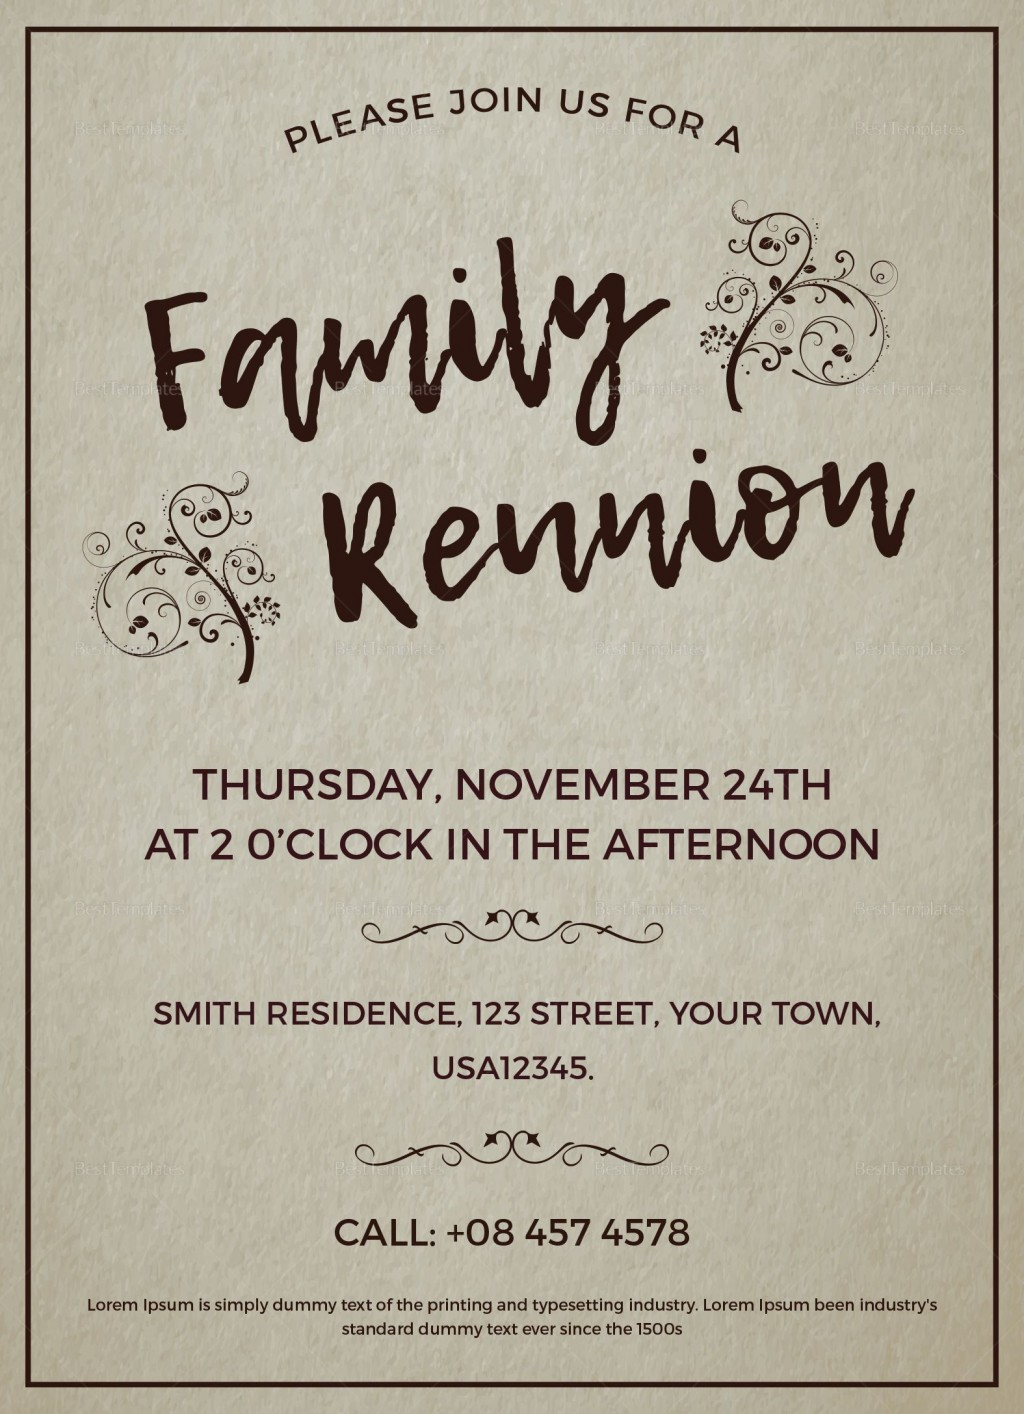 002 Imposing Free Printable Family Reunion Invitation Template Photo  Templates FlyerLarge